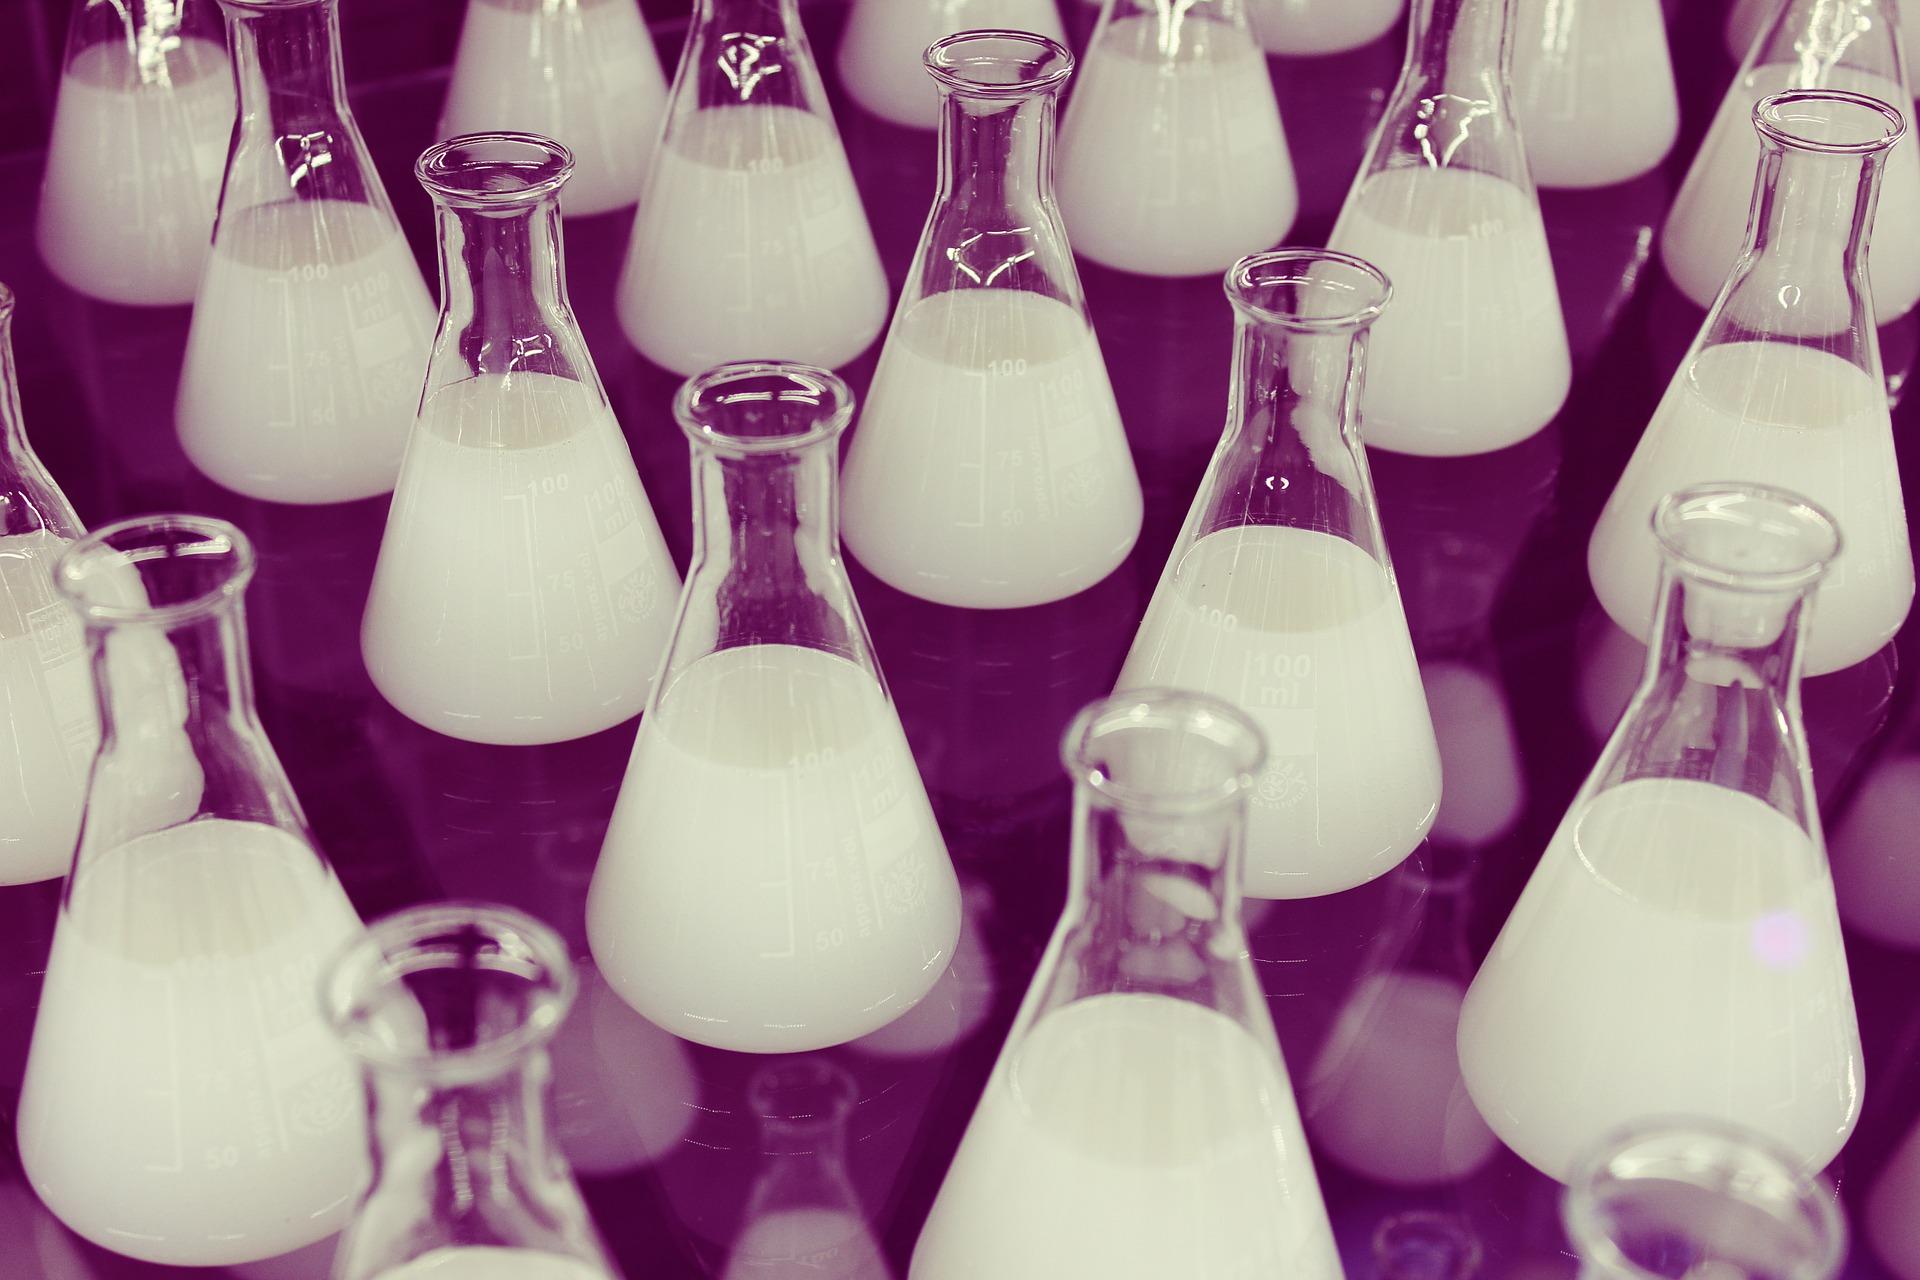 jardins-alcina-liquide-vaisselle